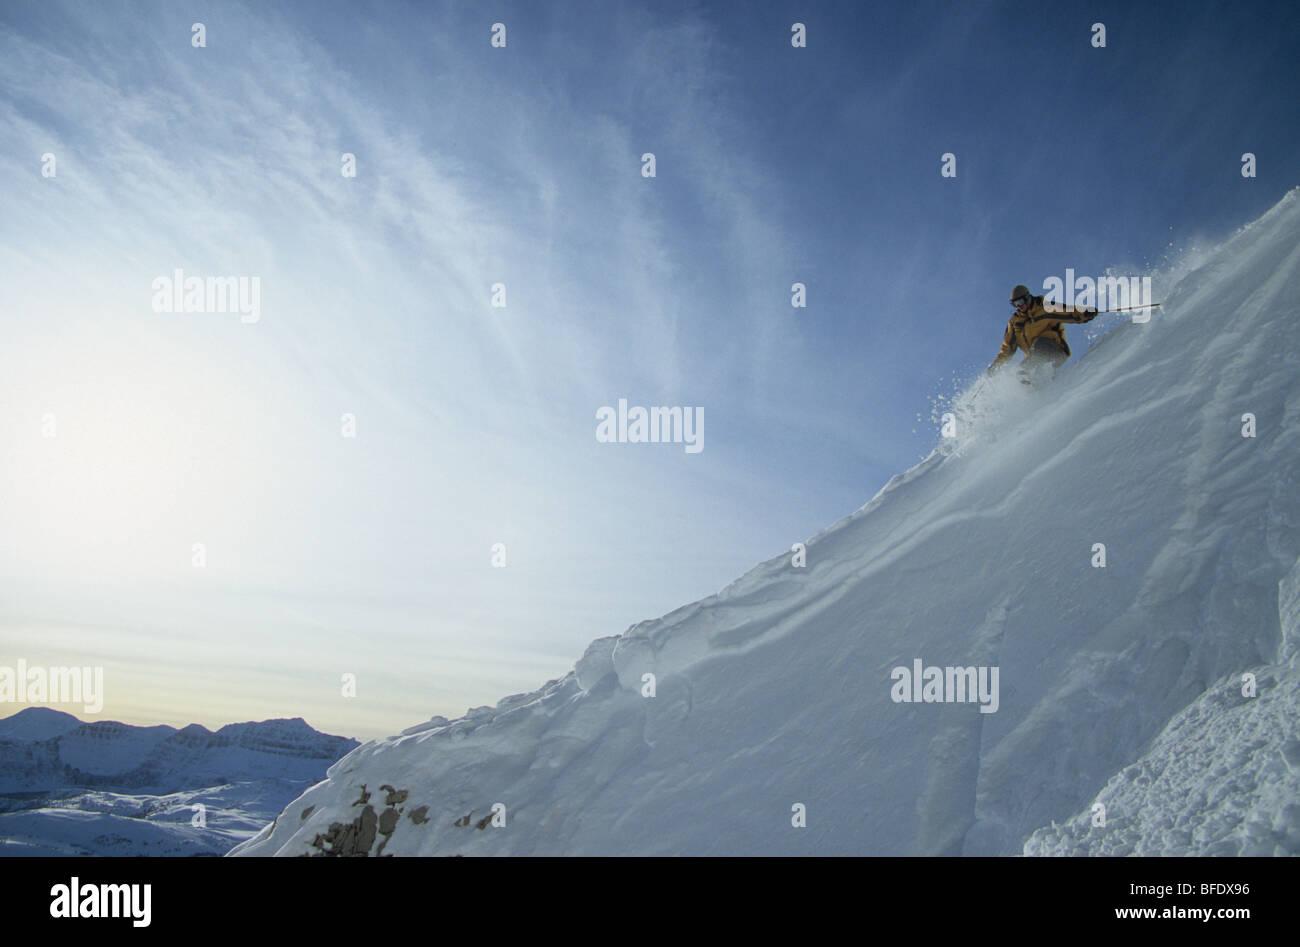 A skier making some powder turns at Sunshine Village, Banff National Park, Alberta, Canada - Stock Image